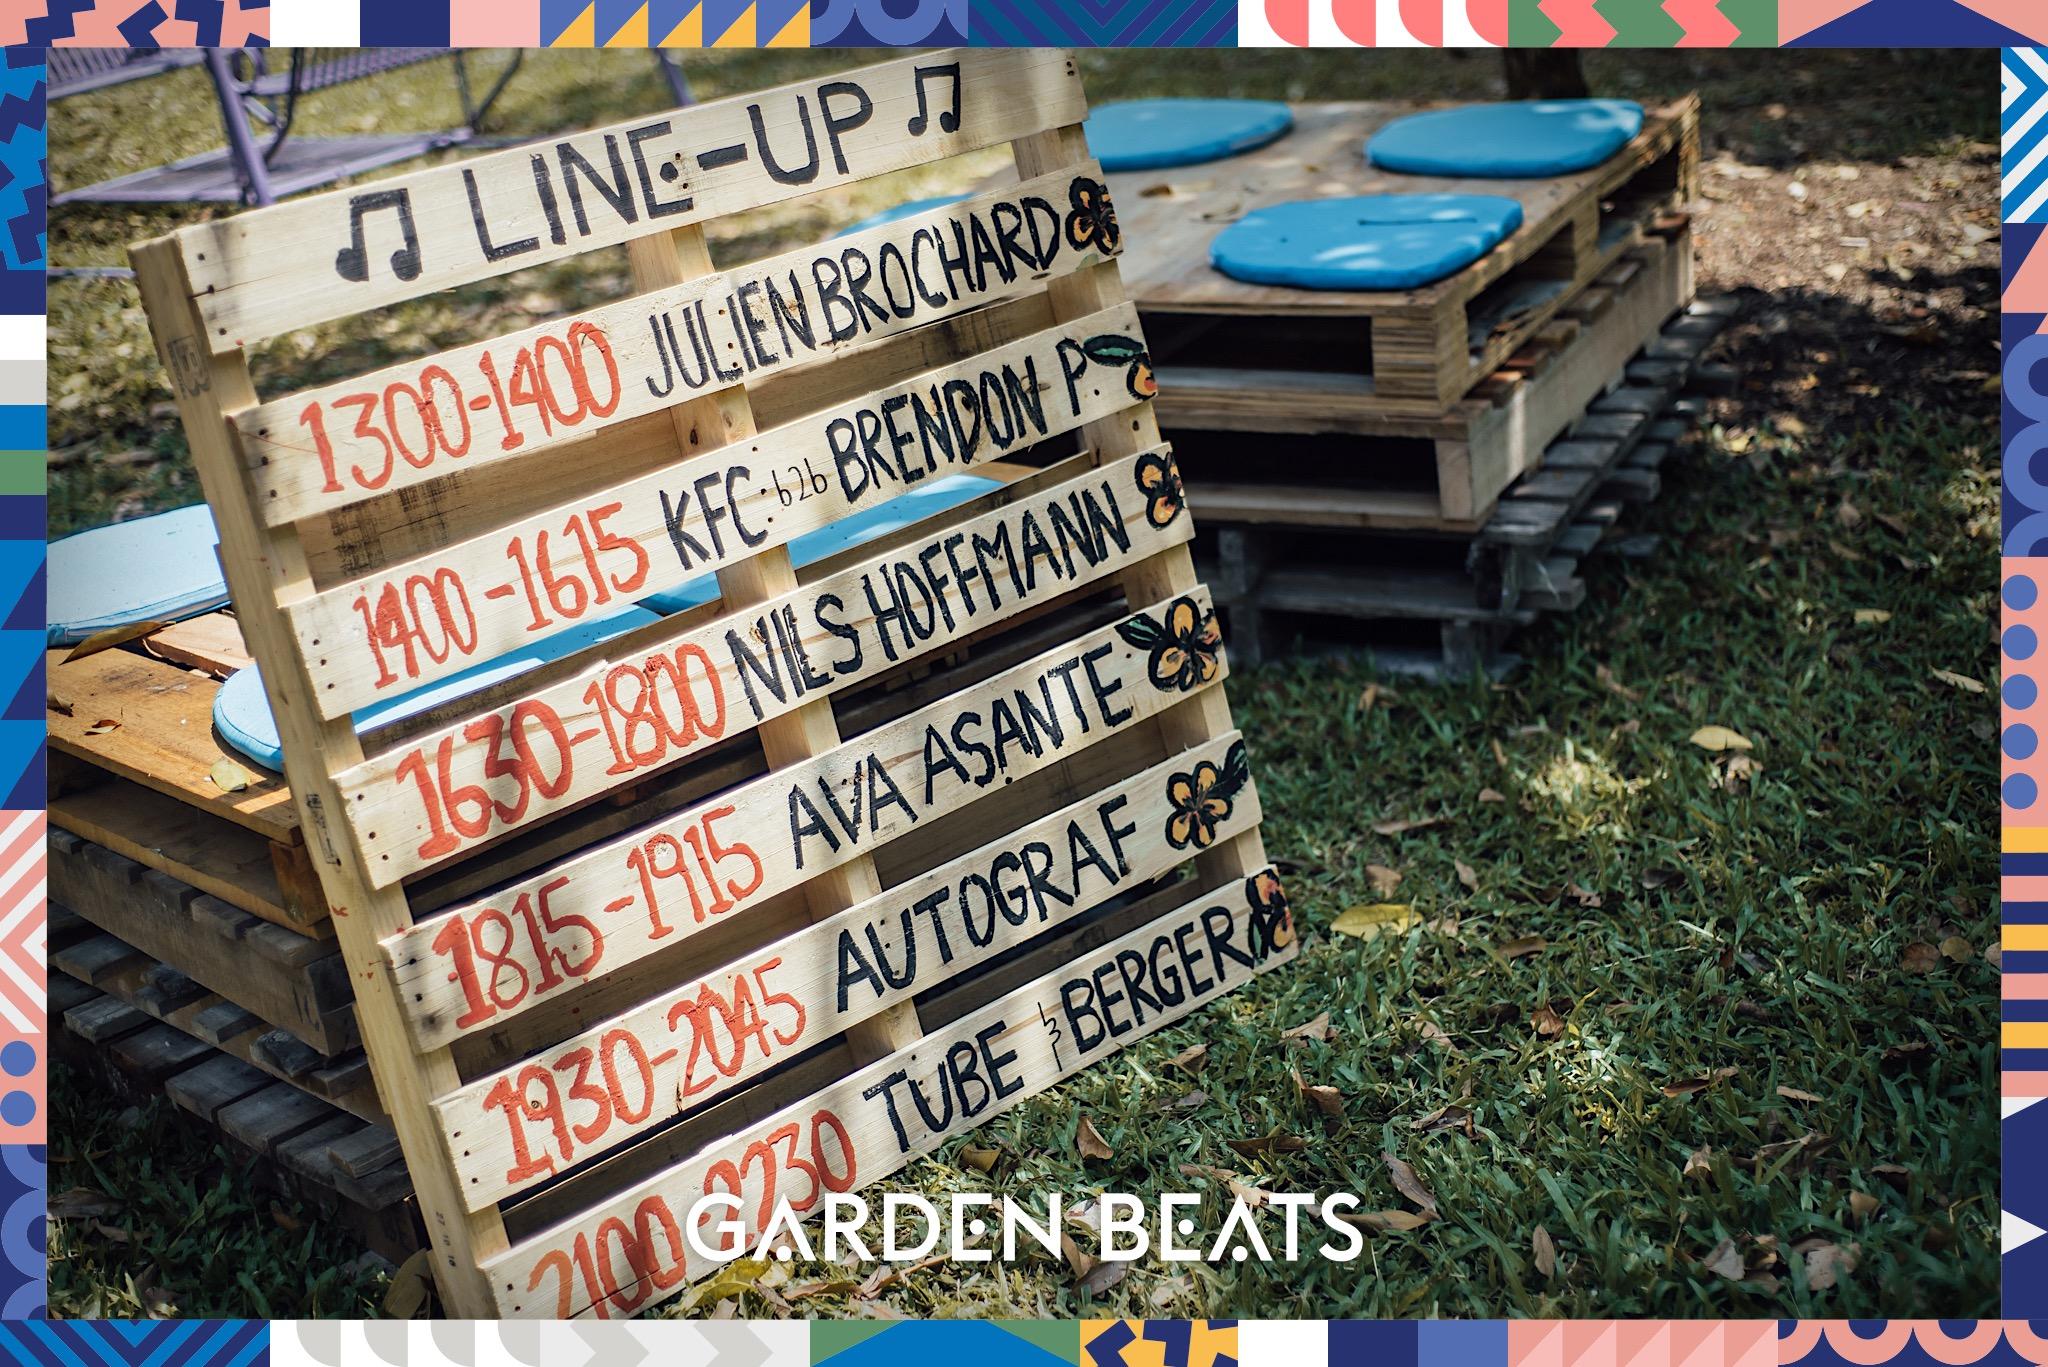 18032017_GardenBeats_Colossal001_WatermarkedGB.jpg